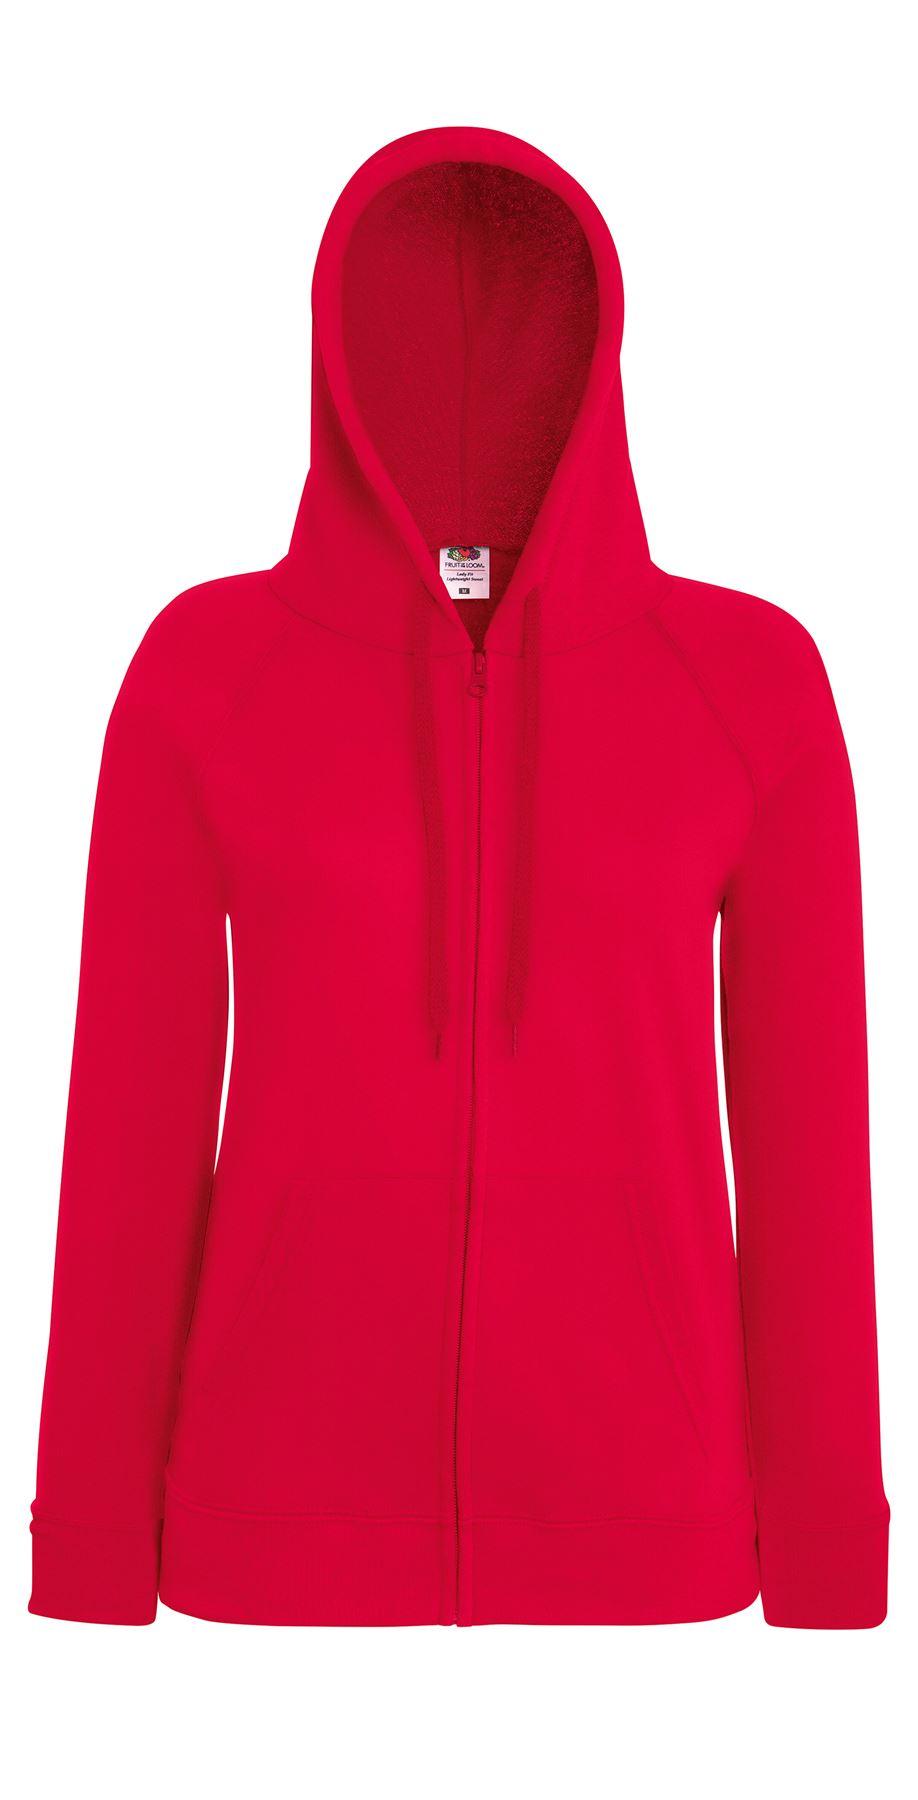 fruit of the loom fotl women 39 s lightweight hooded sweatshirt jacket zip hoodie ebay. Black Bedroom Furniture Sets. Home Design Ideas